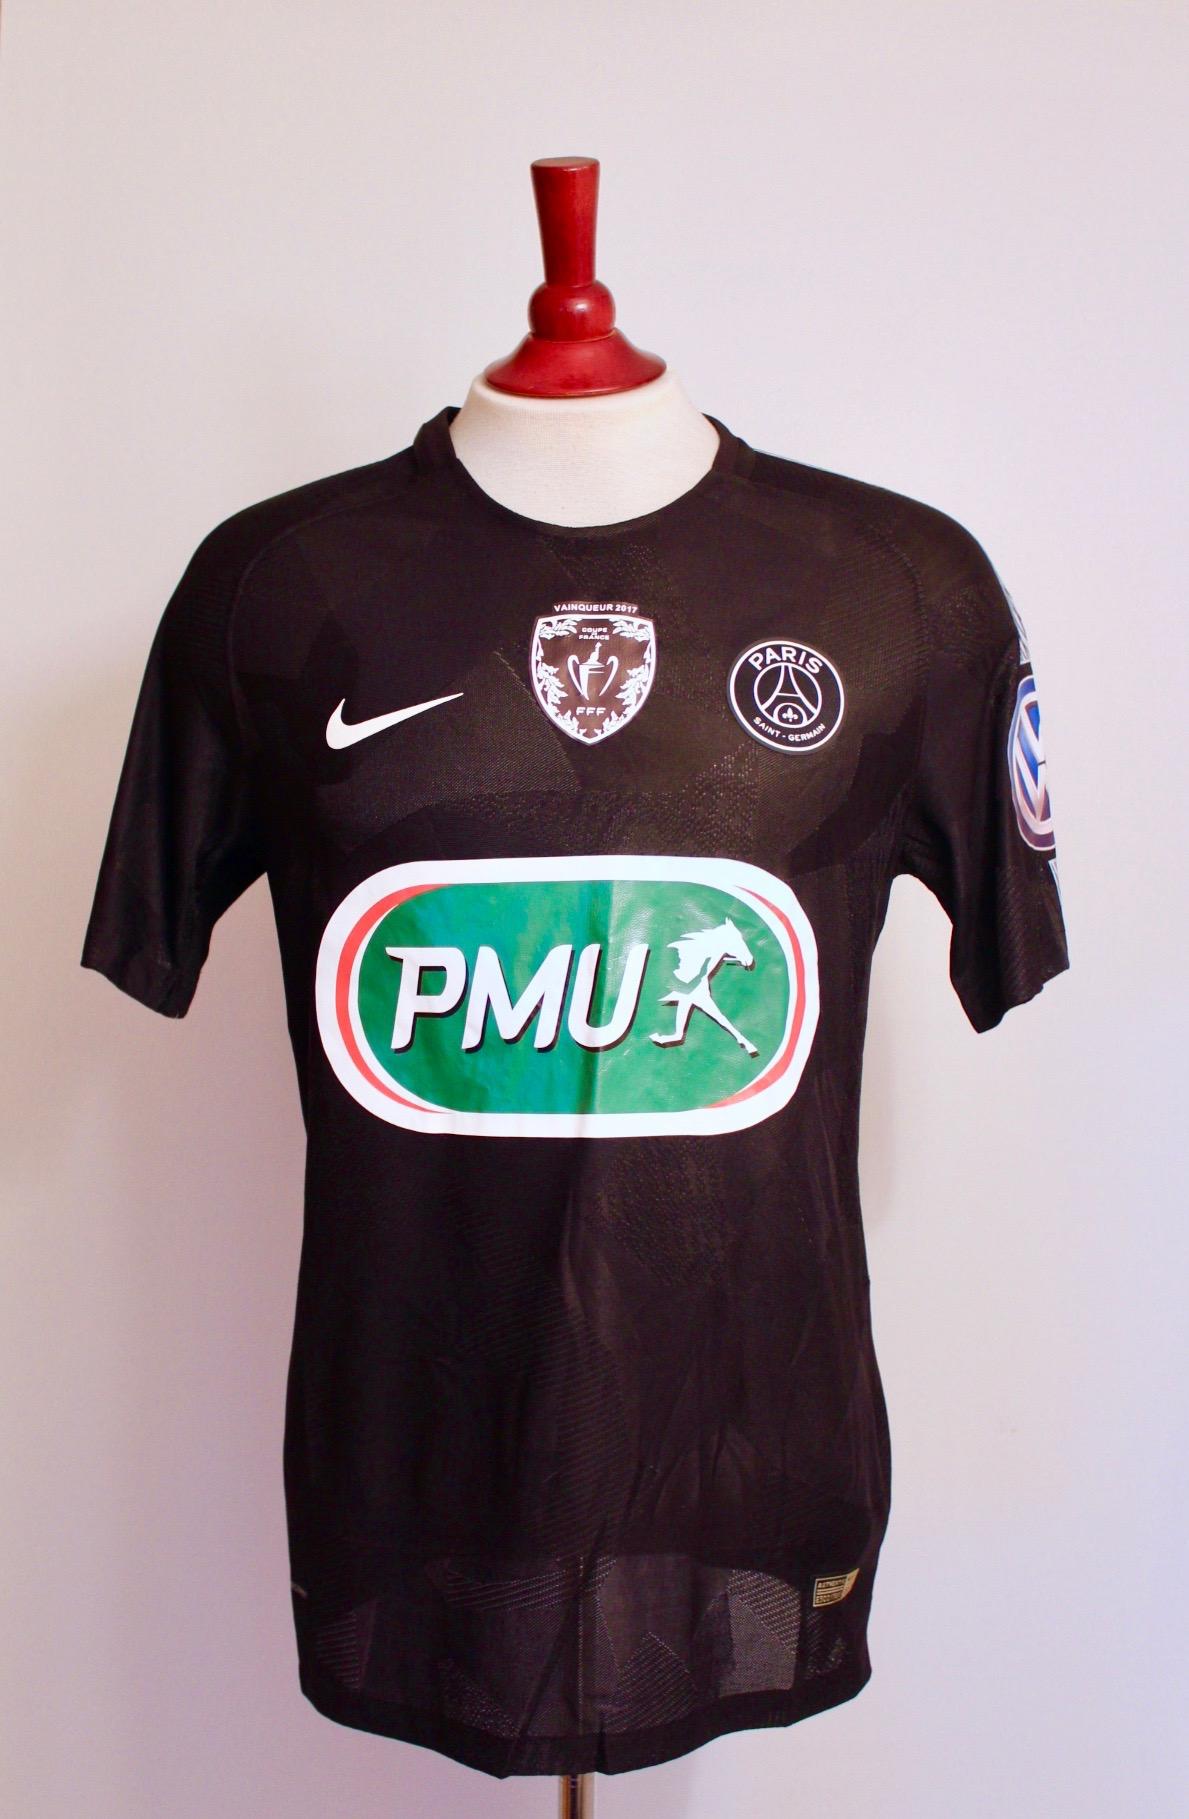 new product 4c38b b98e0 Kylian Mbappe Game-Used #10 Paris Saint Germain Shirt. 2017/18 Coupe de  France (Winners).